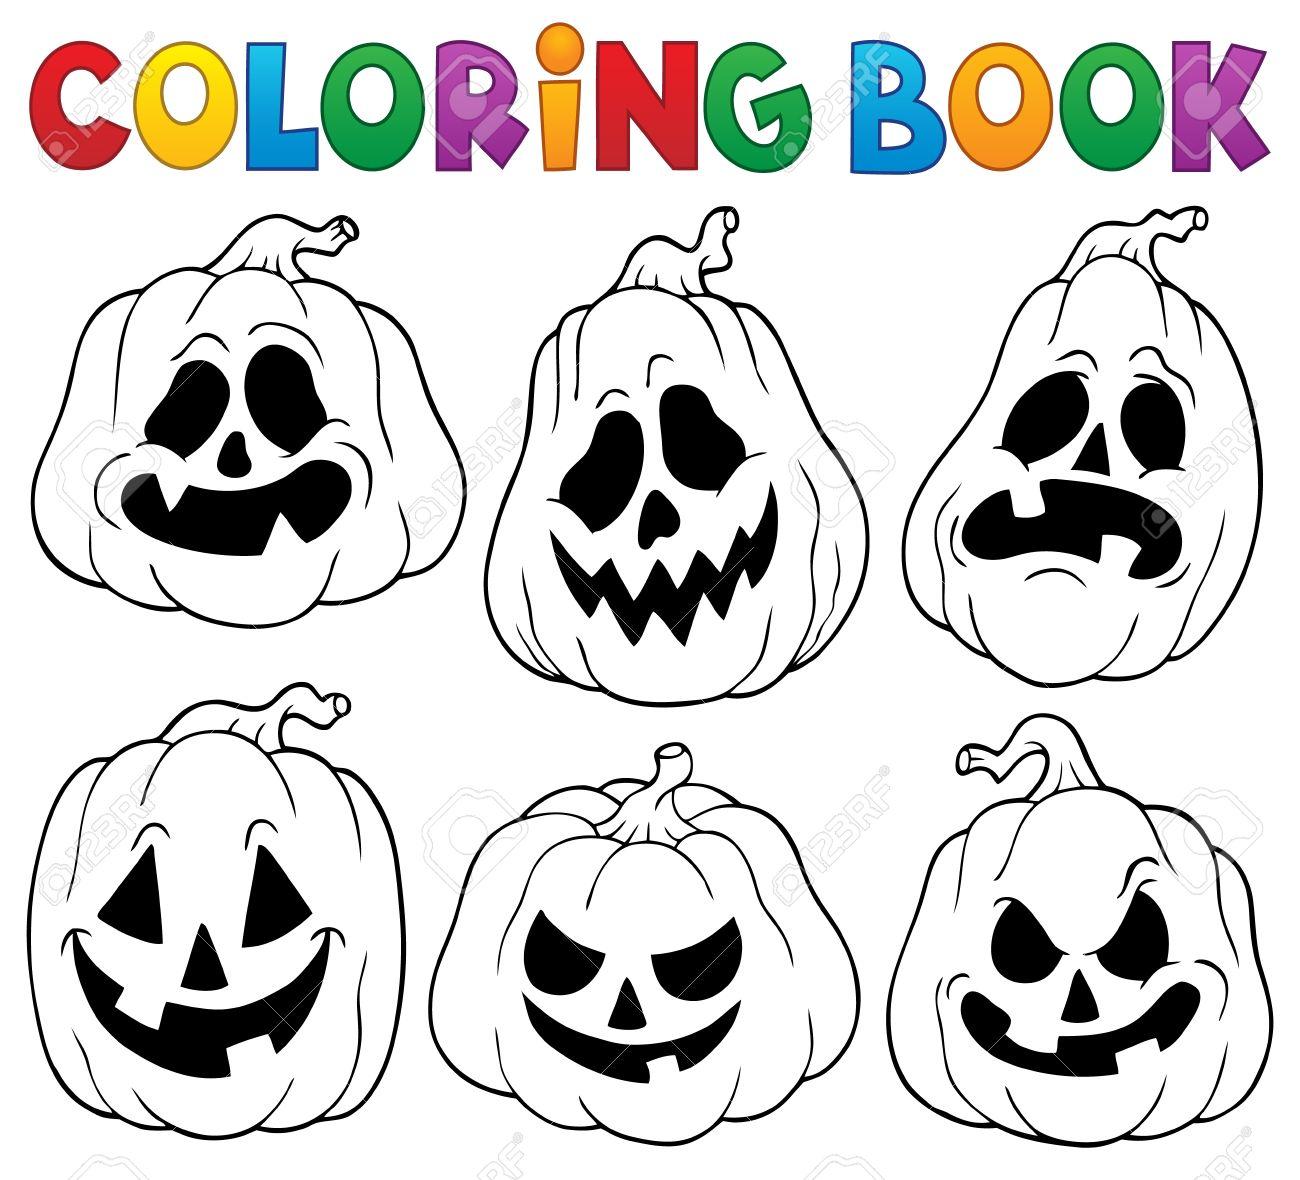 Coloring Book With Halloween Pumpkins Stock Vector